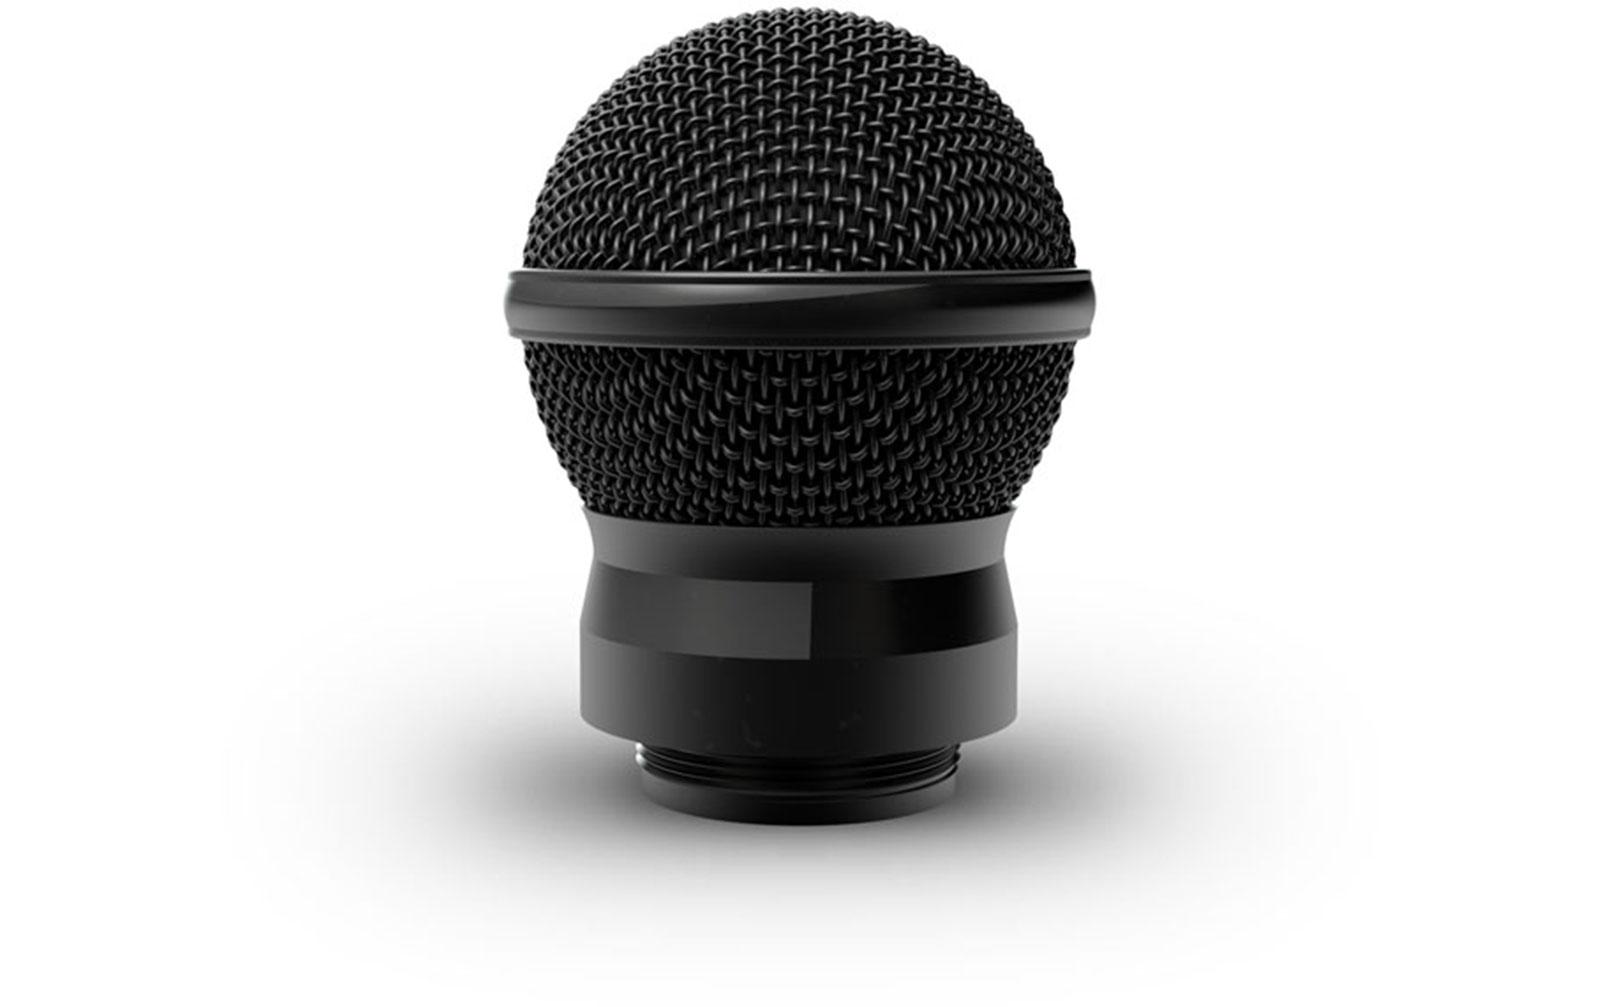 ld-systems-u500-dh-dynamischer-mikrofonkopf-mit-hypernieren-charakteristik